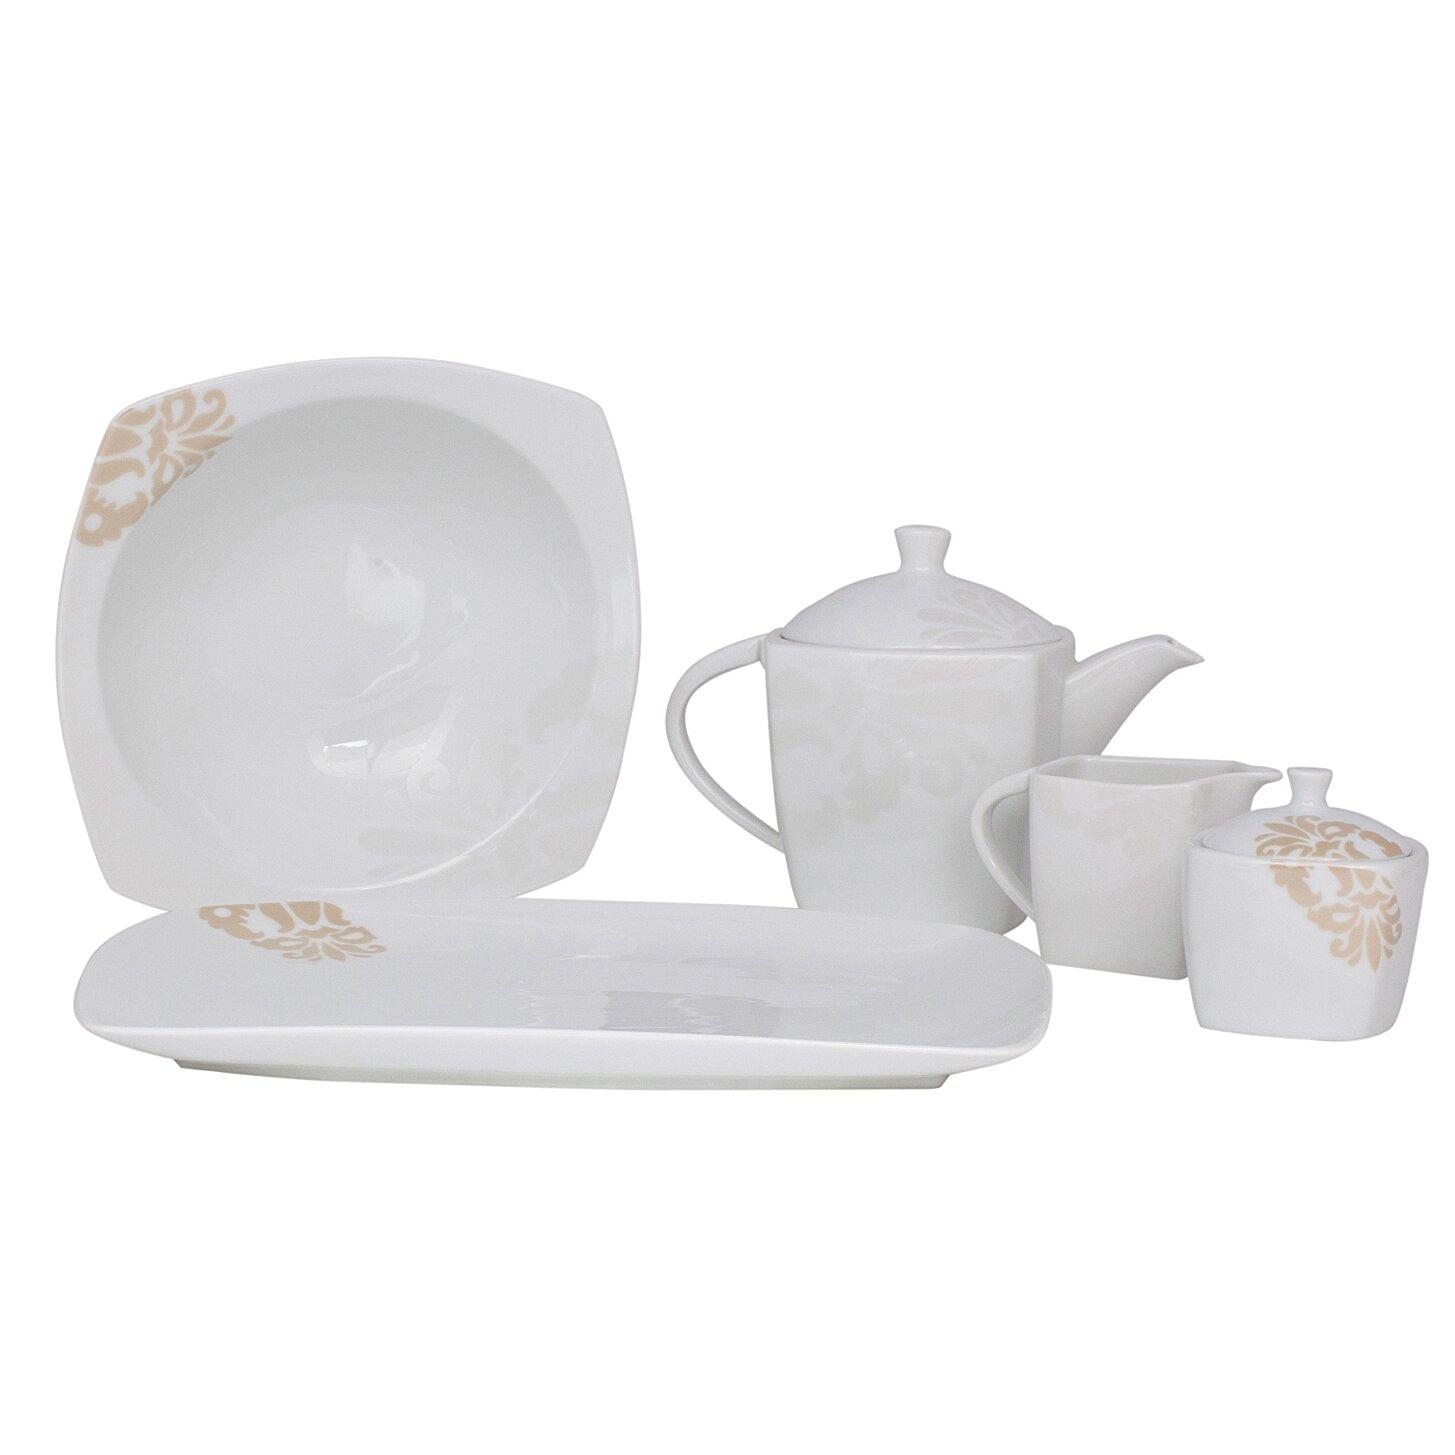 Shinepukur Ceramics USA Inc Bloomfield Square Fine China Traditional Servin